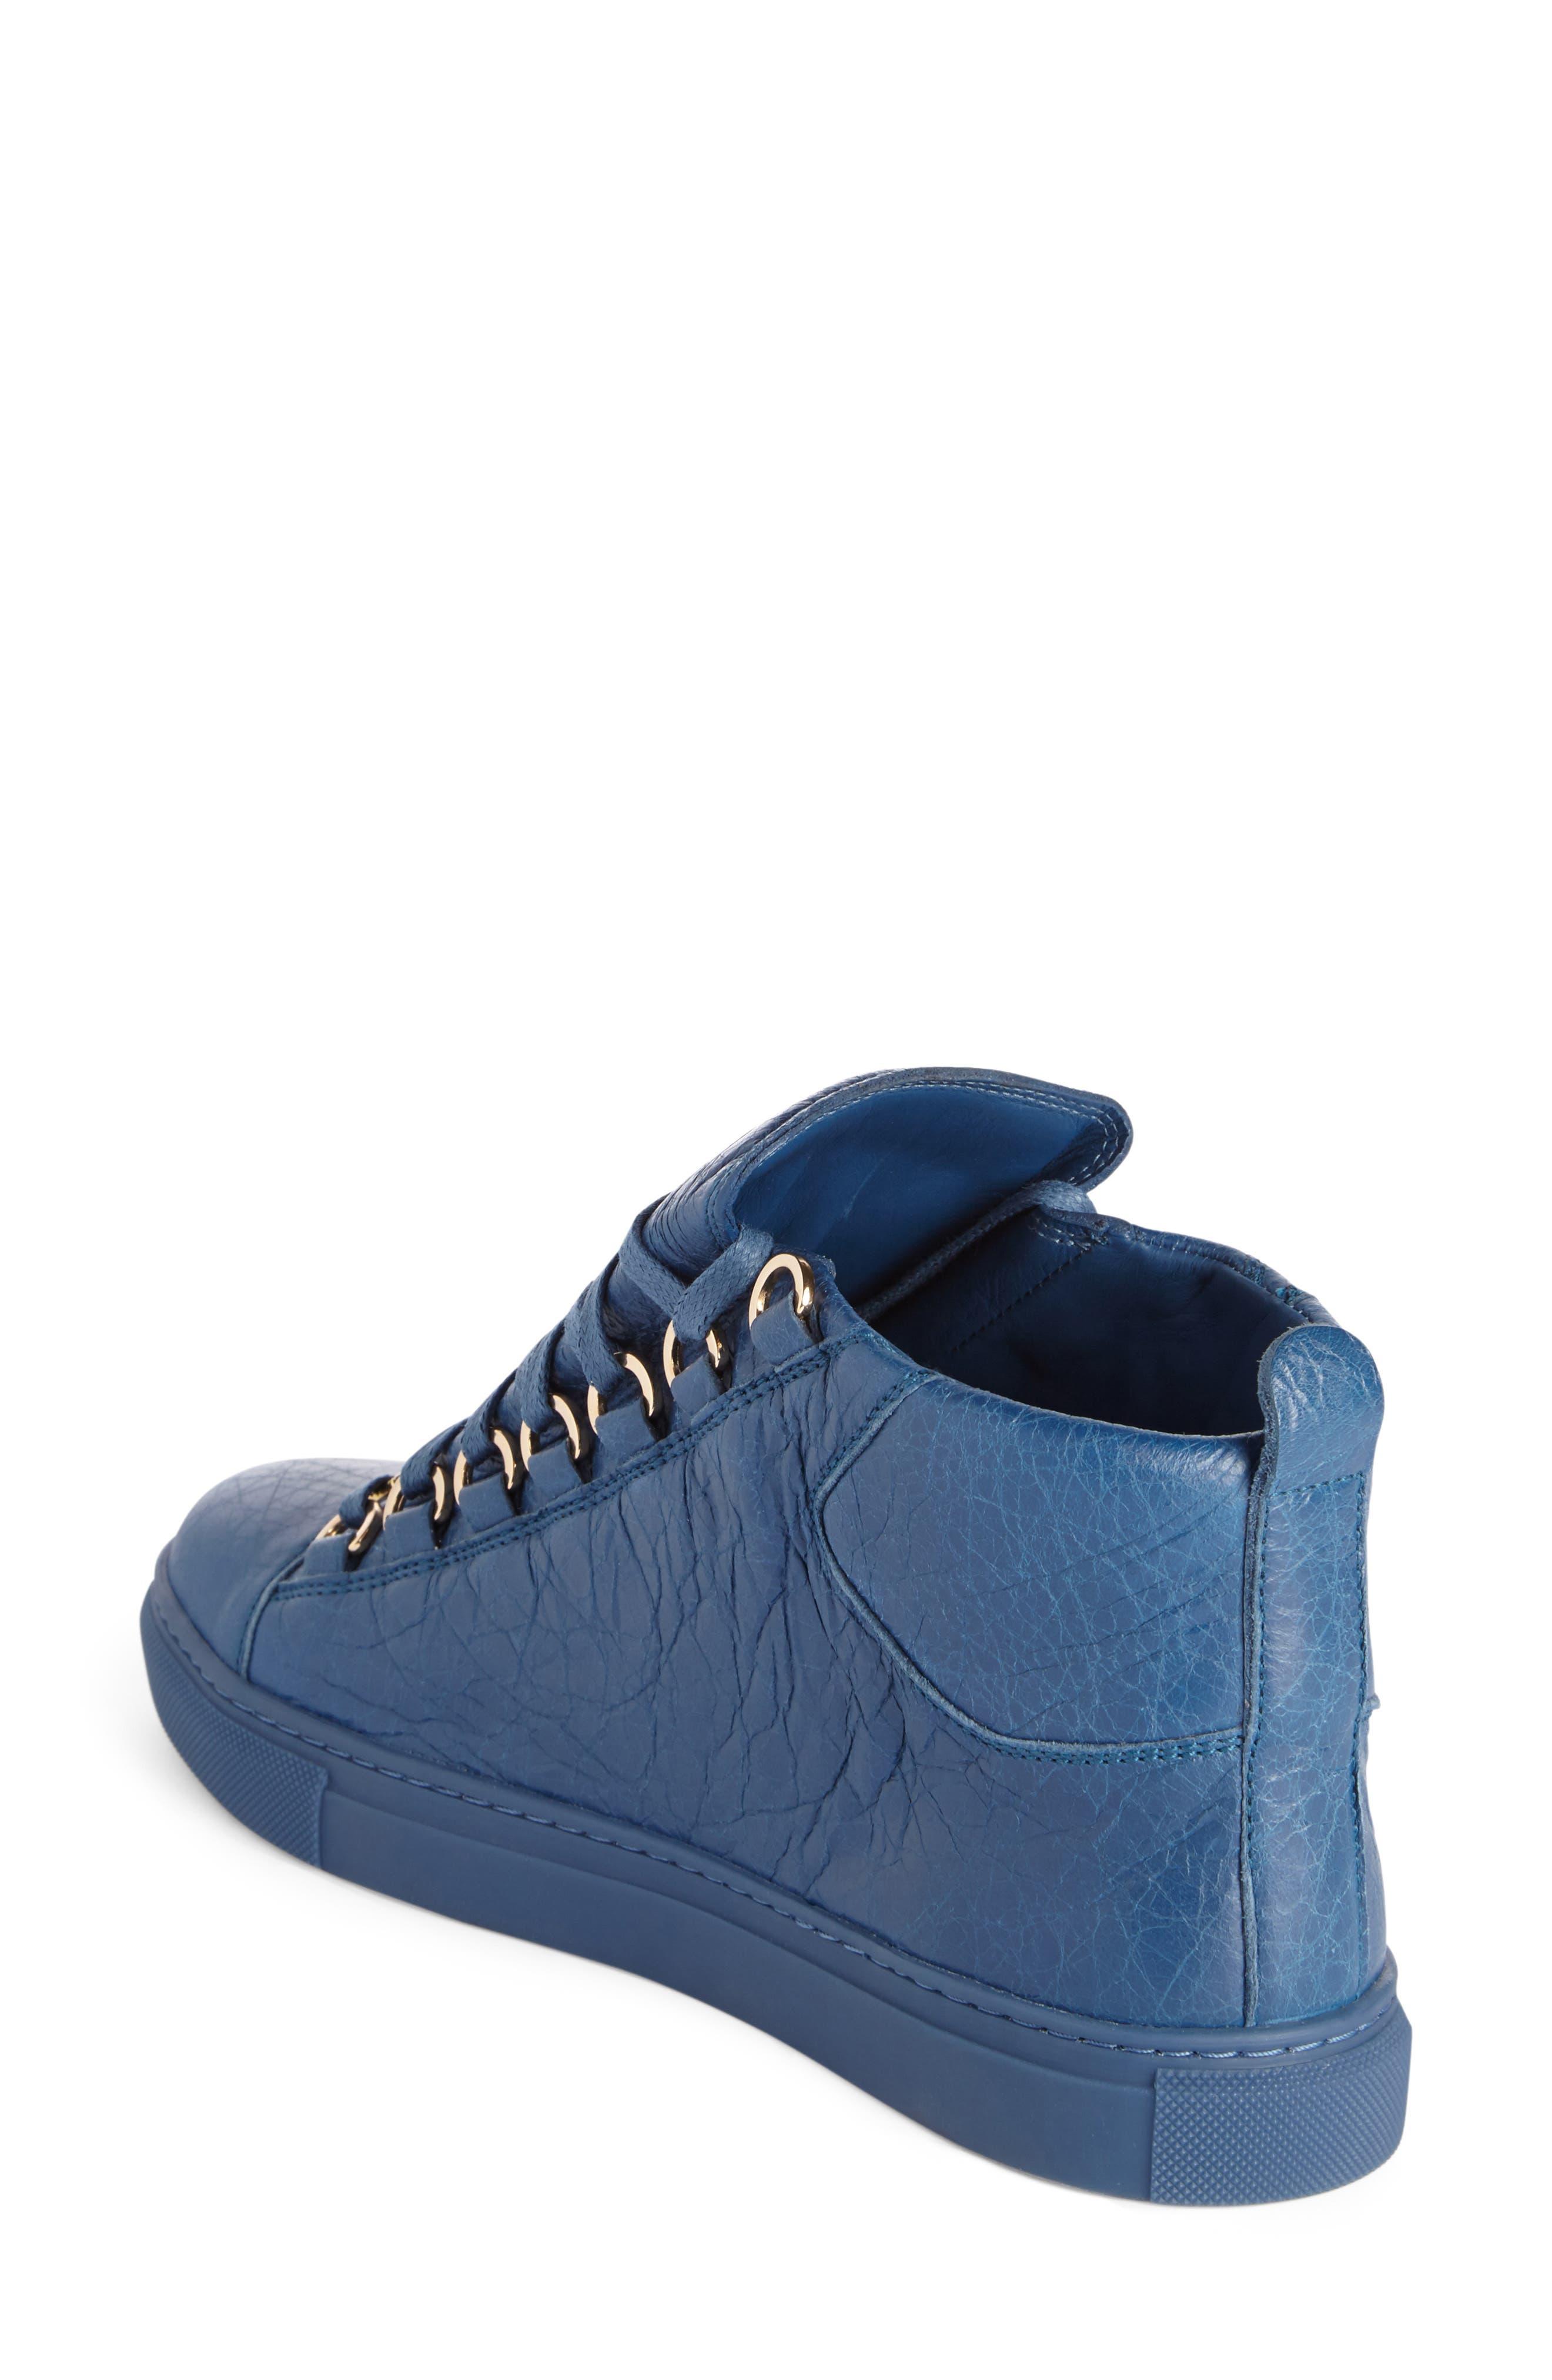 High Top Sneaker,                             Alternate thumbnail 12, color,